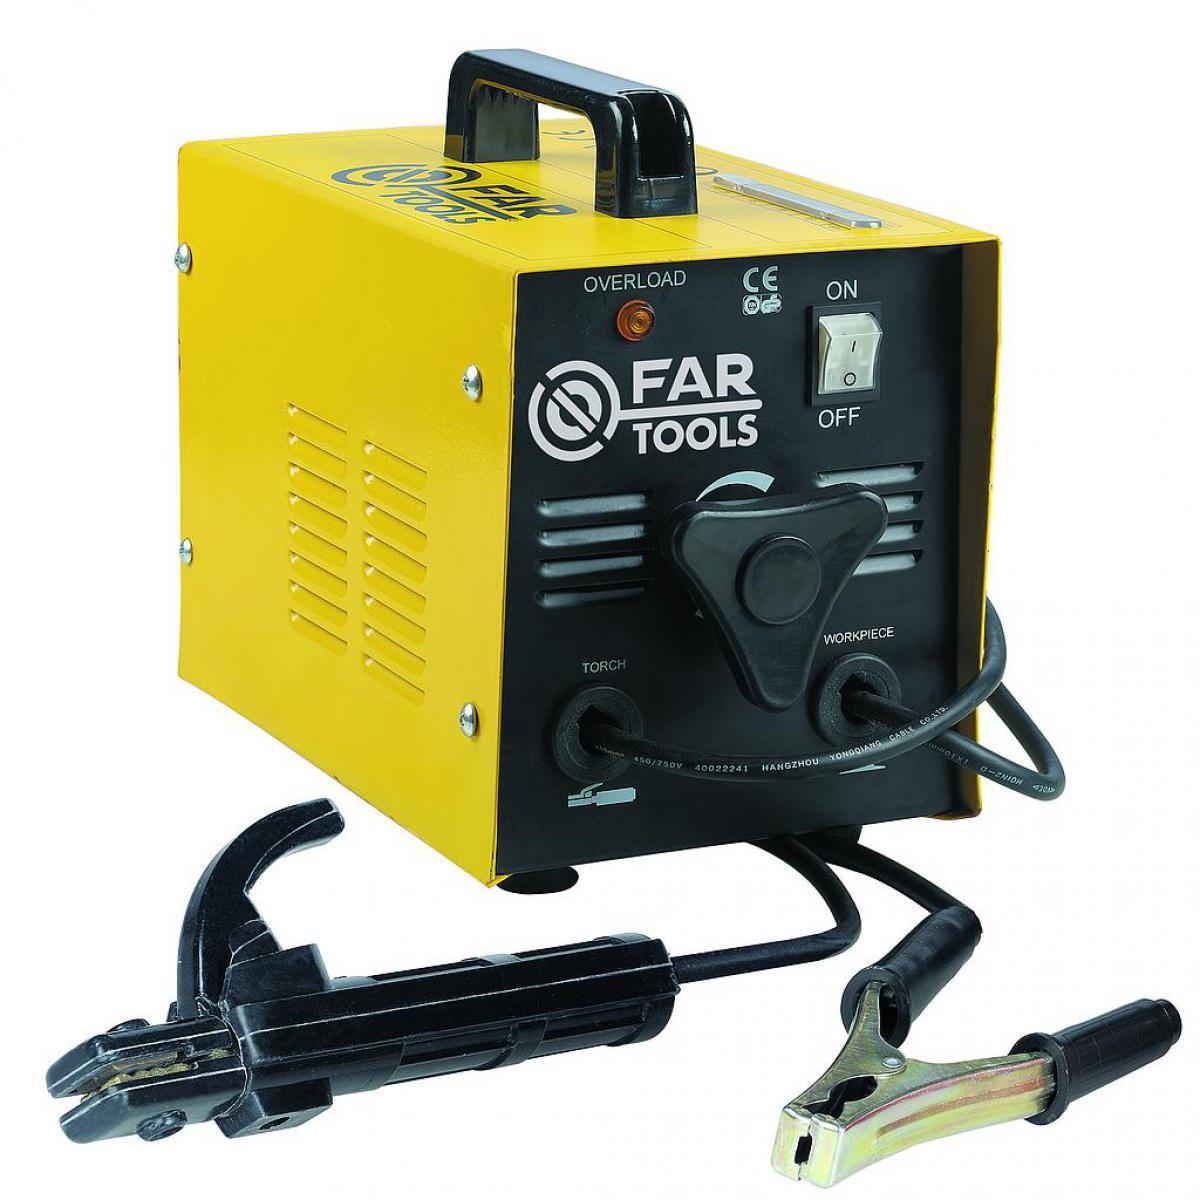 Fartools Fartools - Poste à souder à l'arc MMA 130 A 6,55 kW - WELDER140C